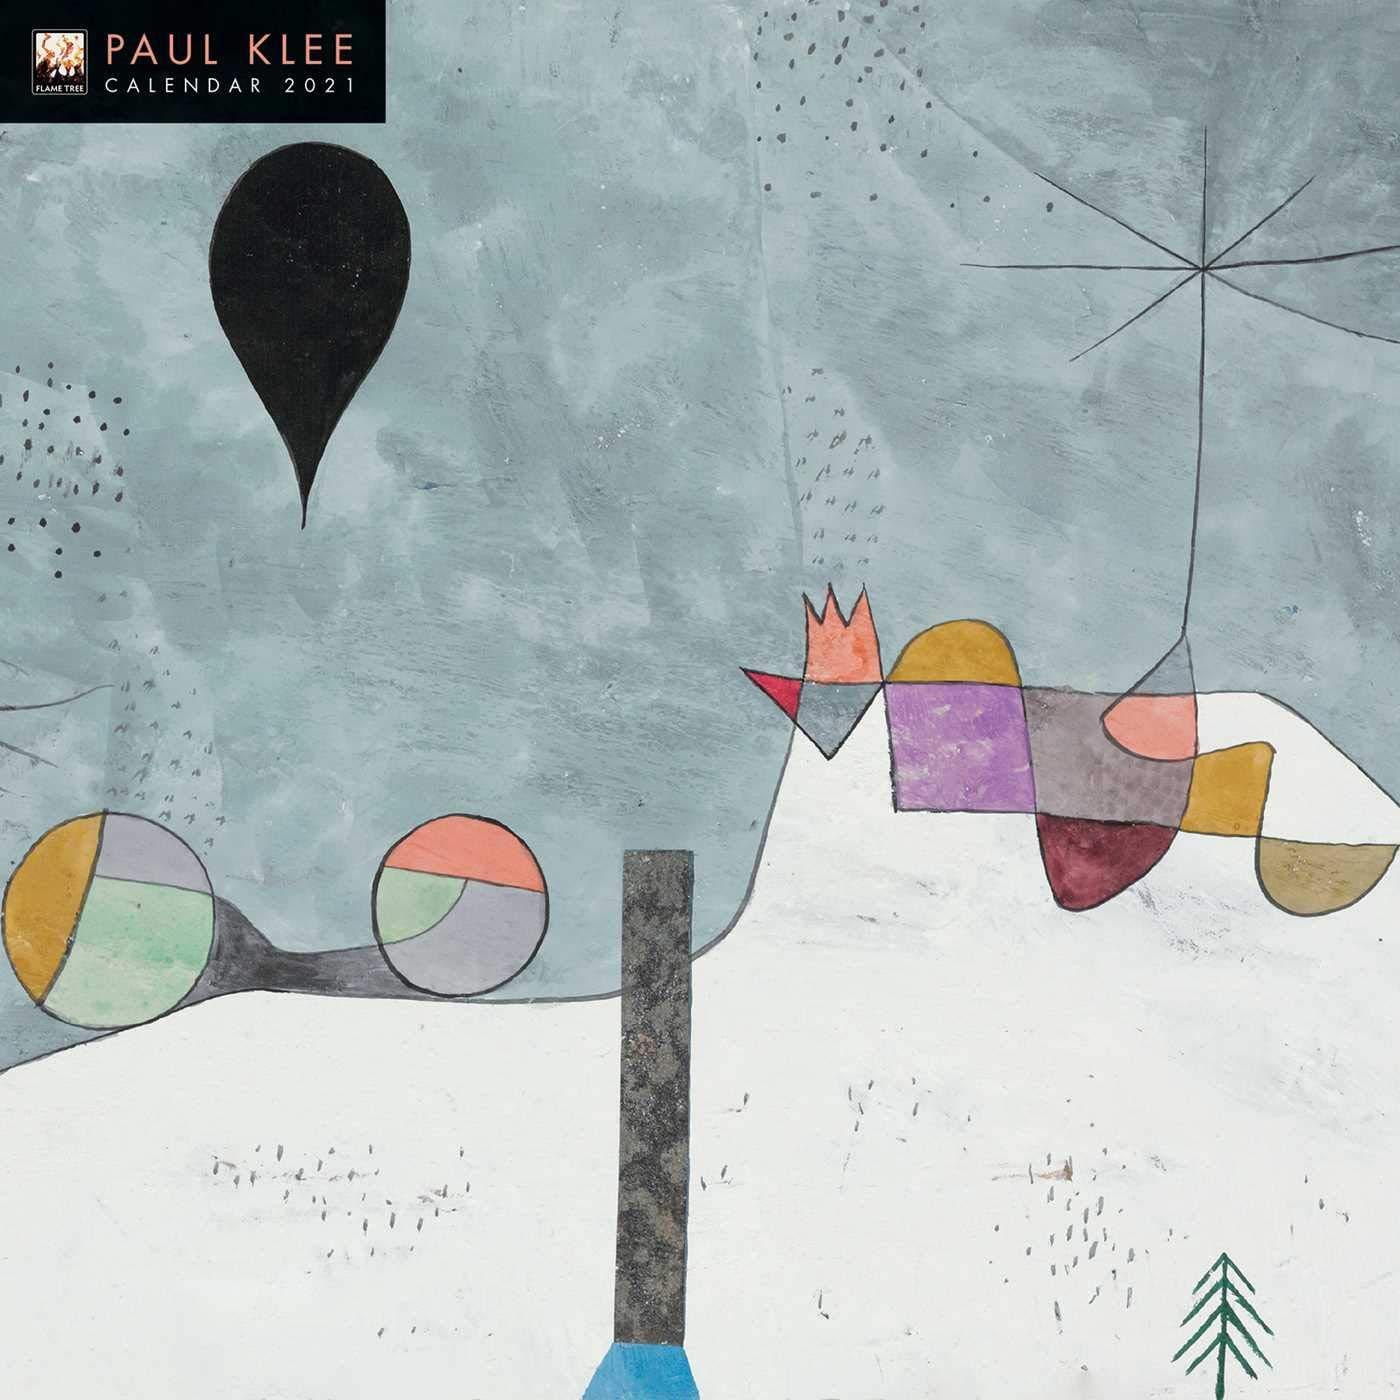 Paul Klee Wall Calendar 2021 (Art Calendar): Flame Tree Studio